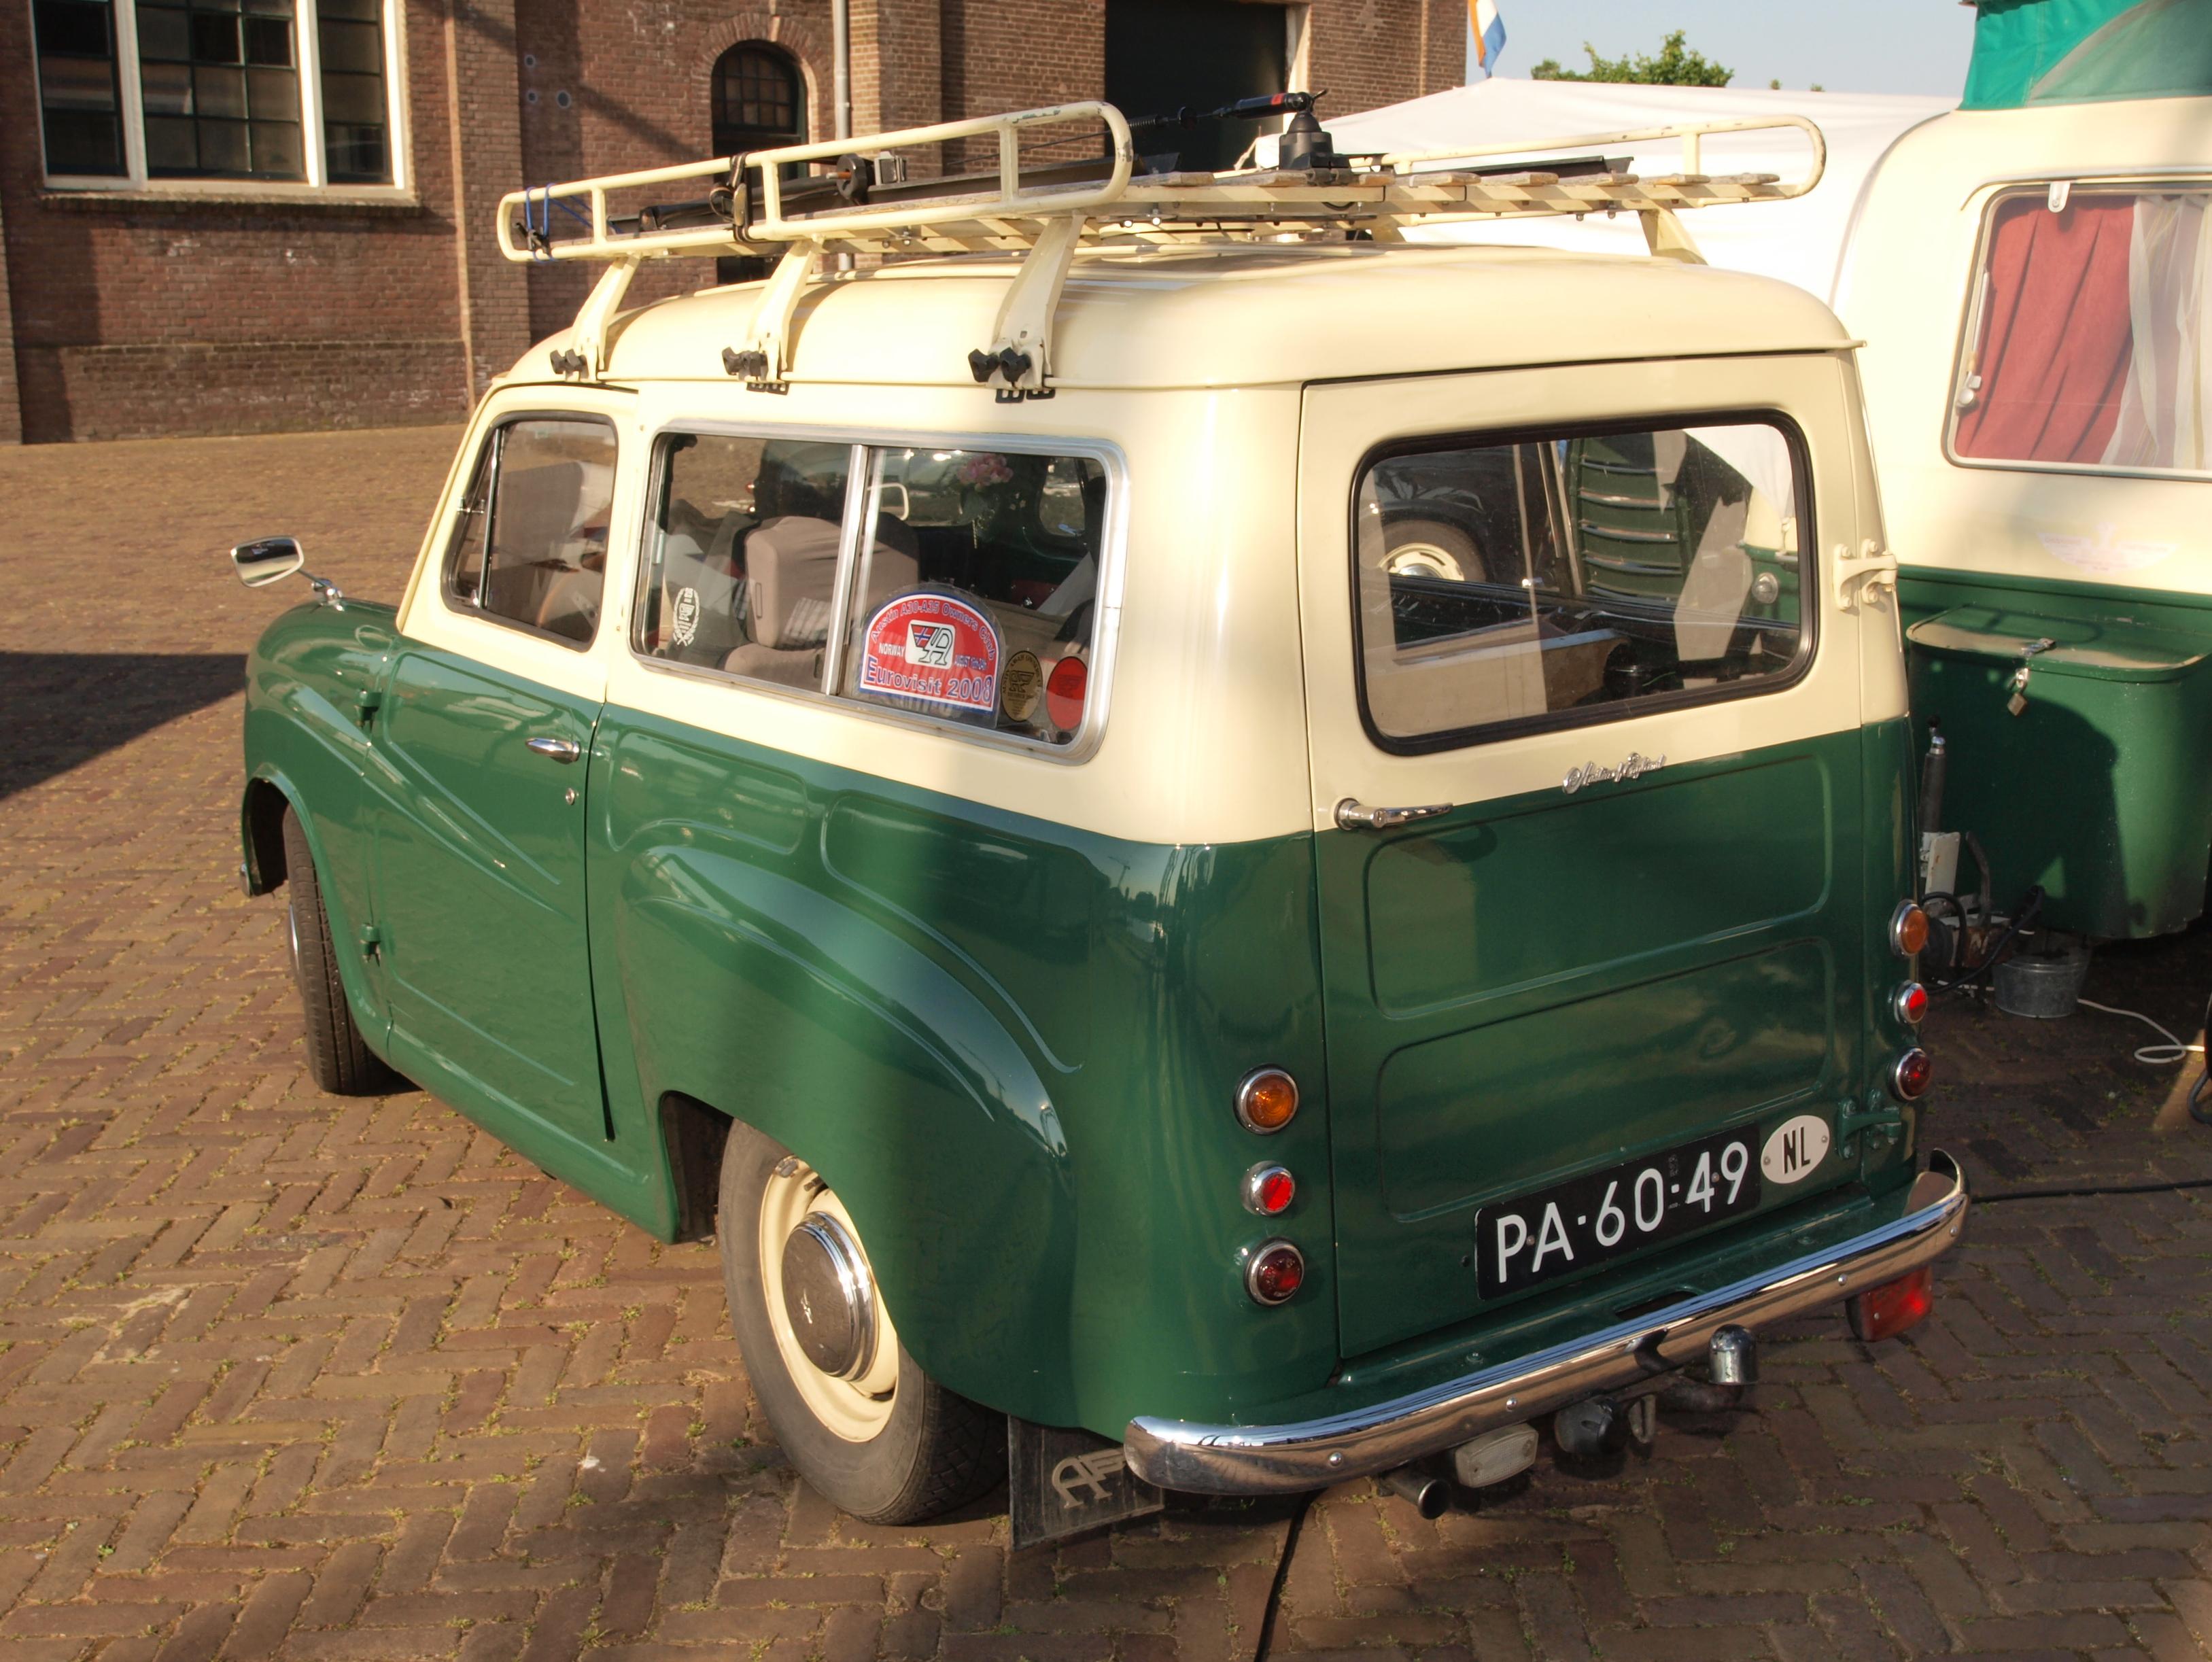 File:Austin A30 (1955), Dutch licence registration PA-60-49 pic1 ...